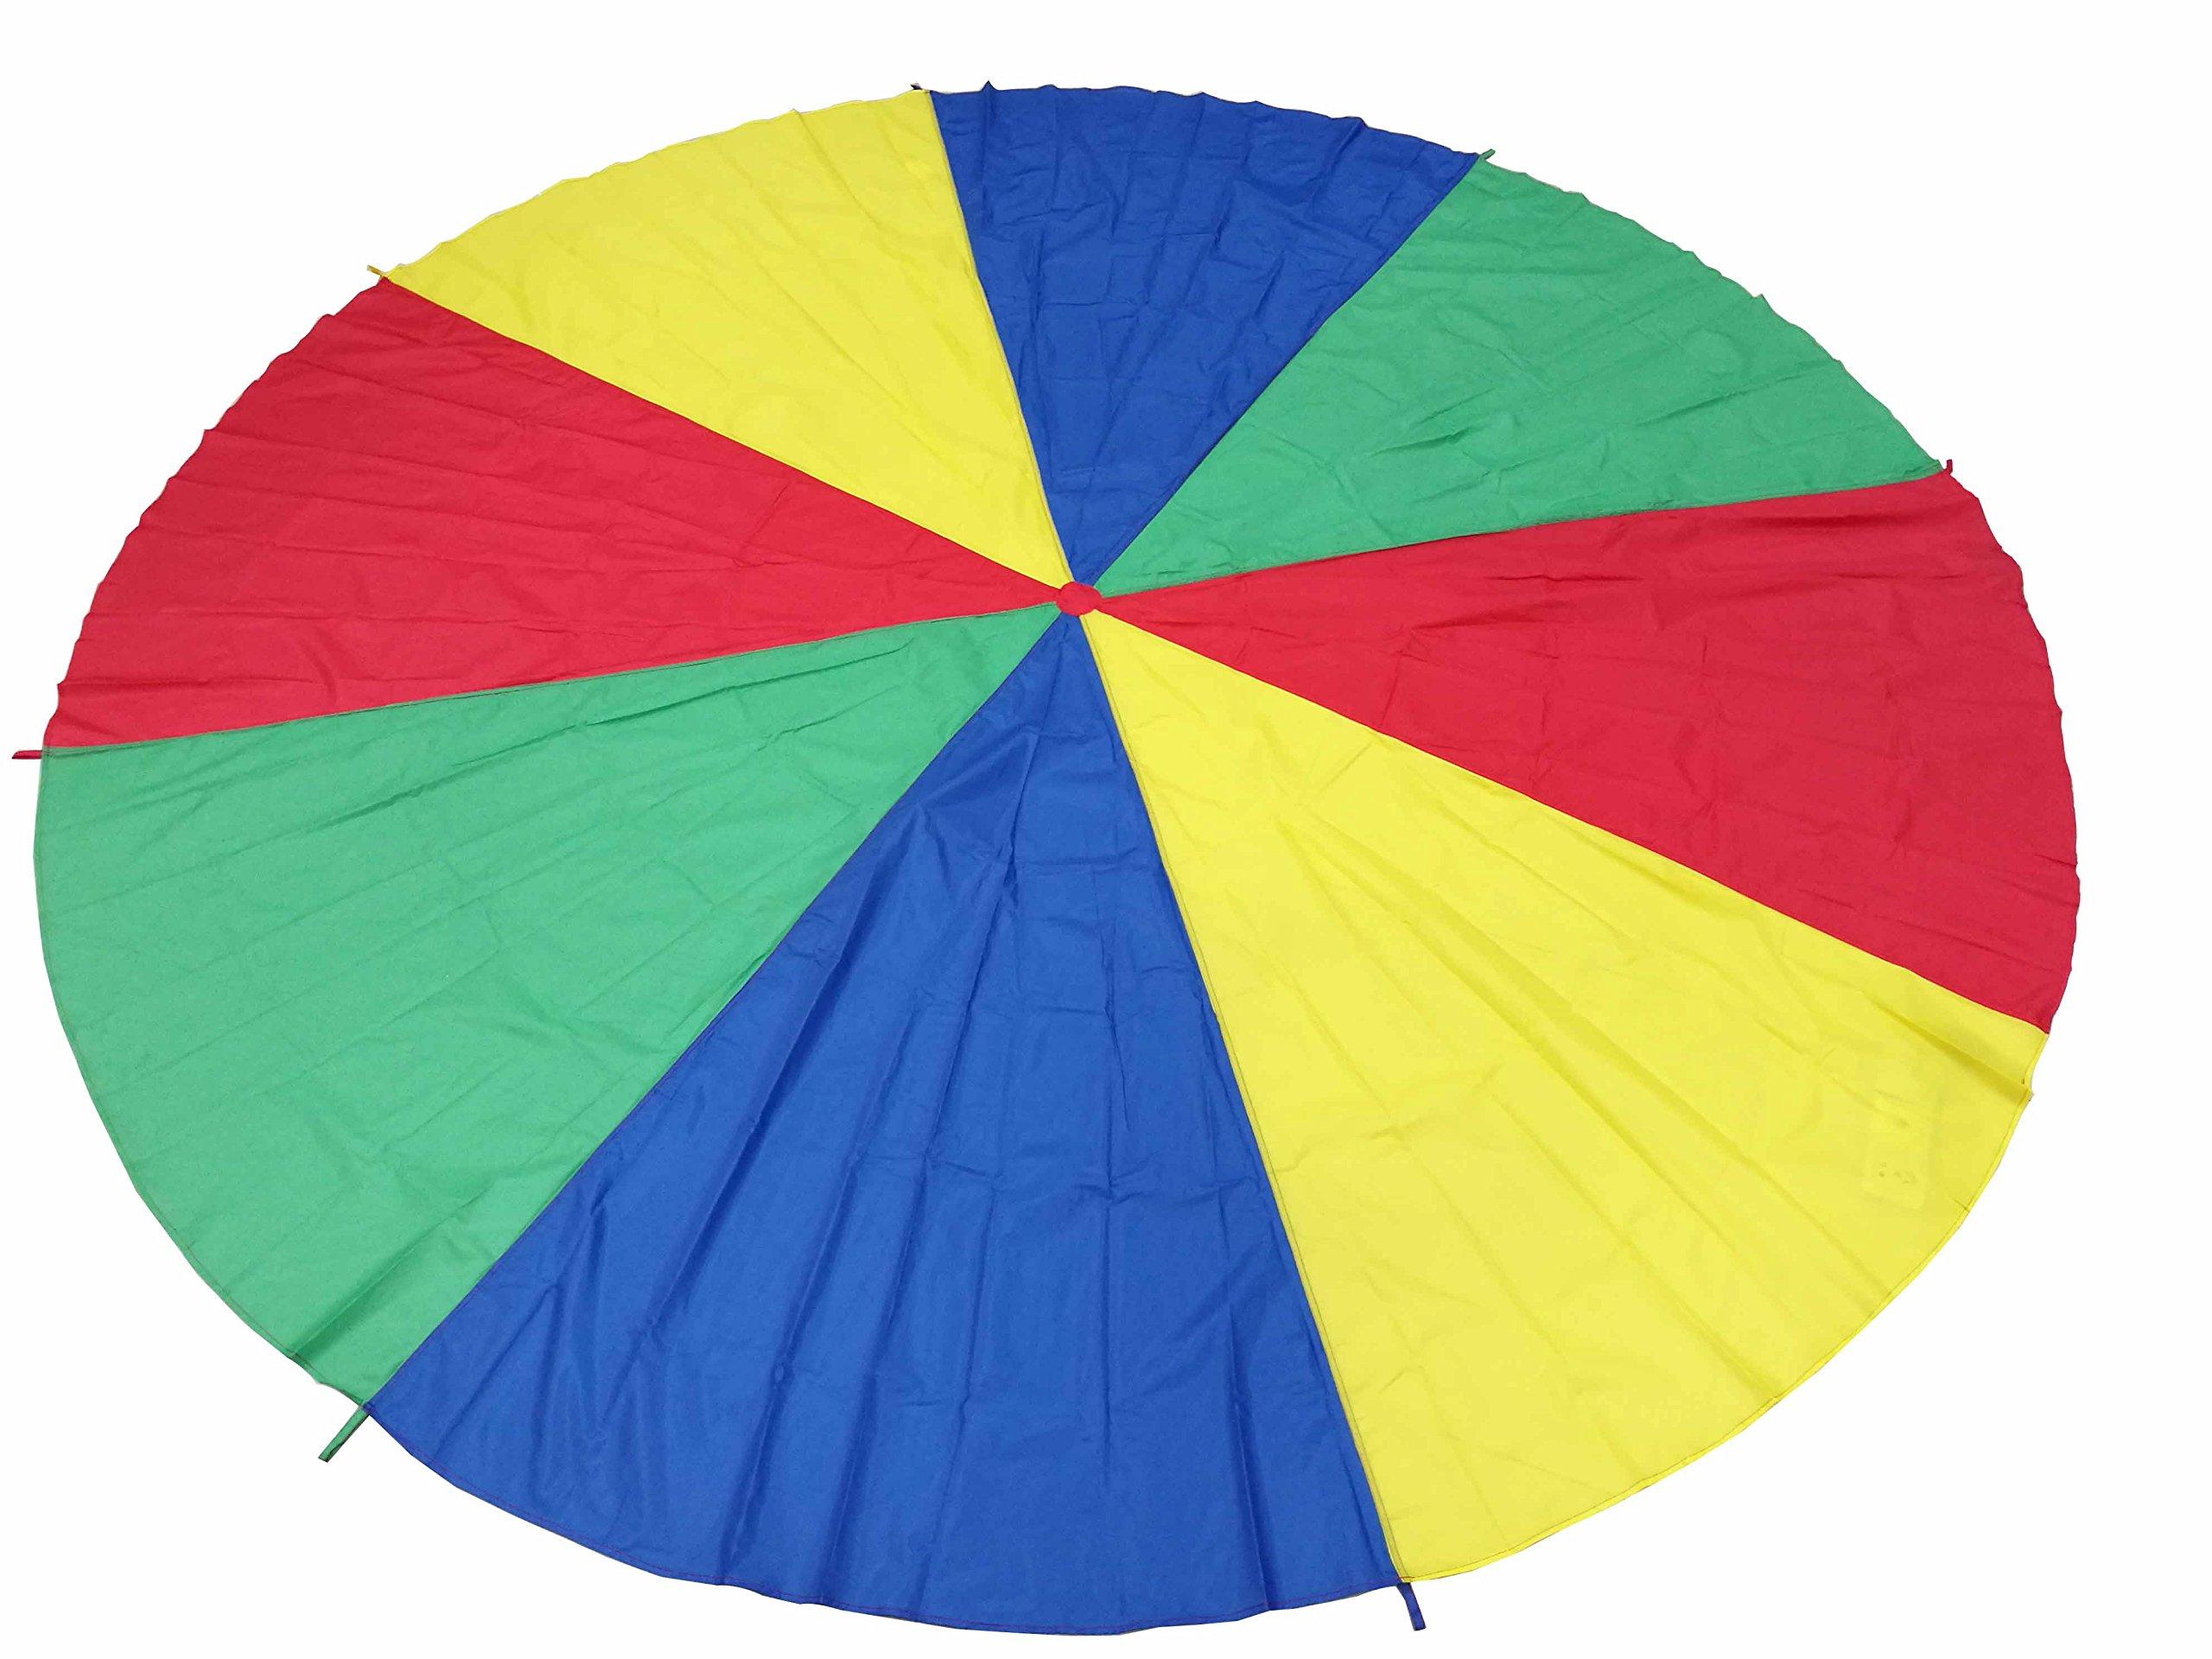 FixtureDisplays 12 Foot Play Parachute for Kids 8 Handles with Storage Bag Play Parachute for Kids Tent Picnic Mat Blanket 16877-NF